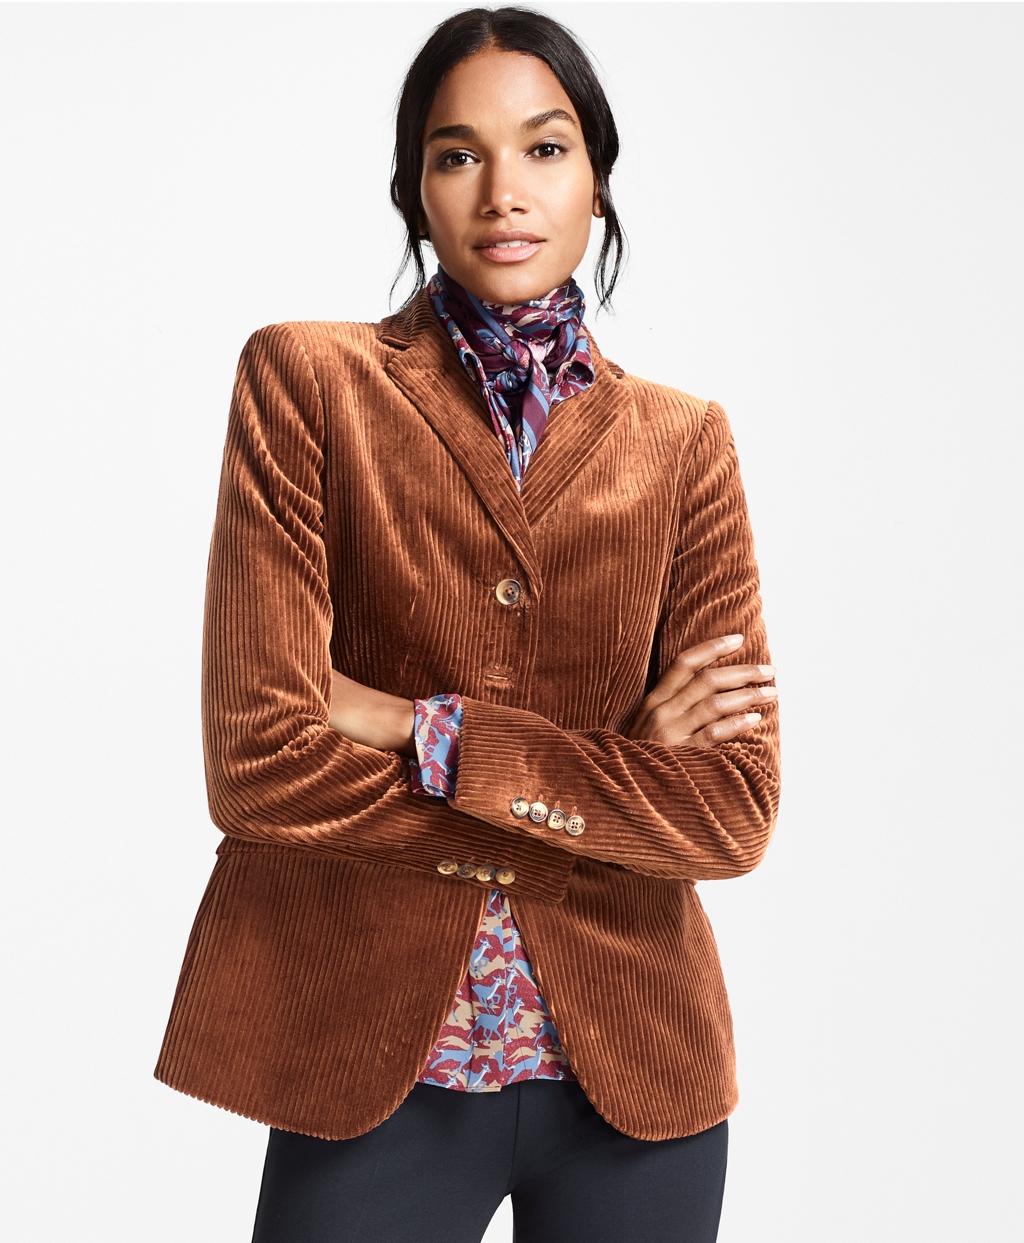 70s Jackets & Hippie Vests, Ponchos Brooks Brothers Womens Cotton Corduroy Jacket $398.00 AT vintagedancer.com